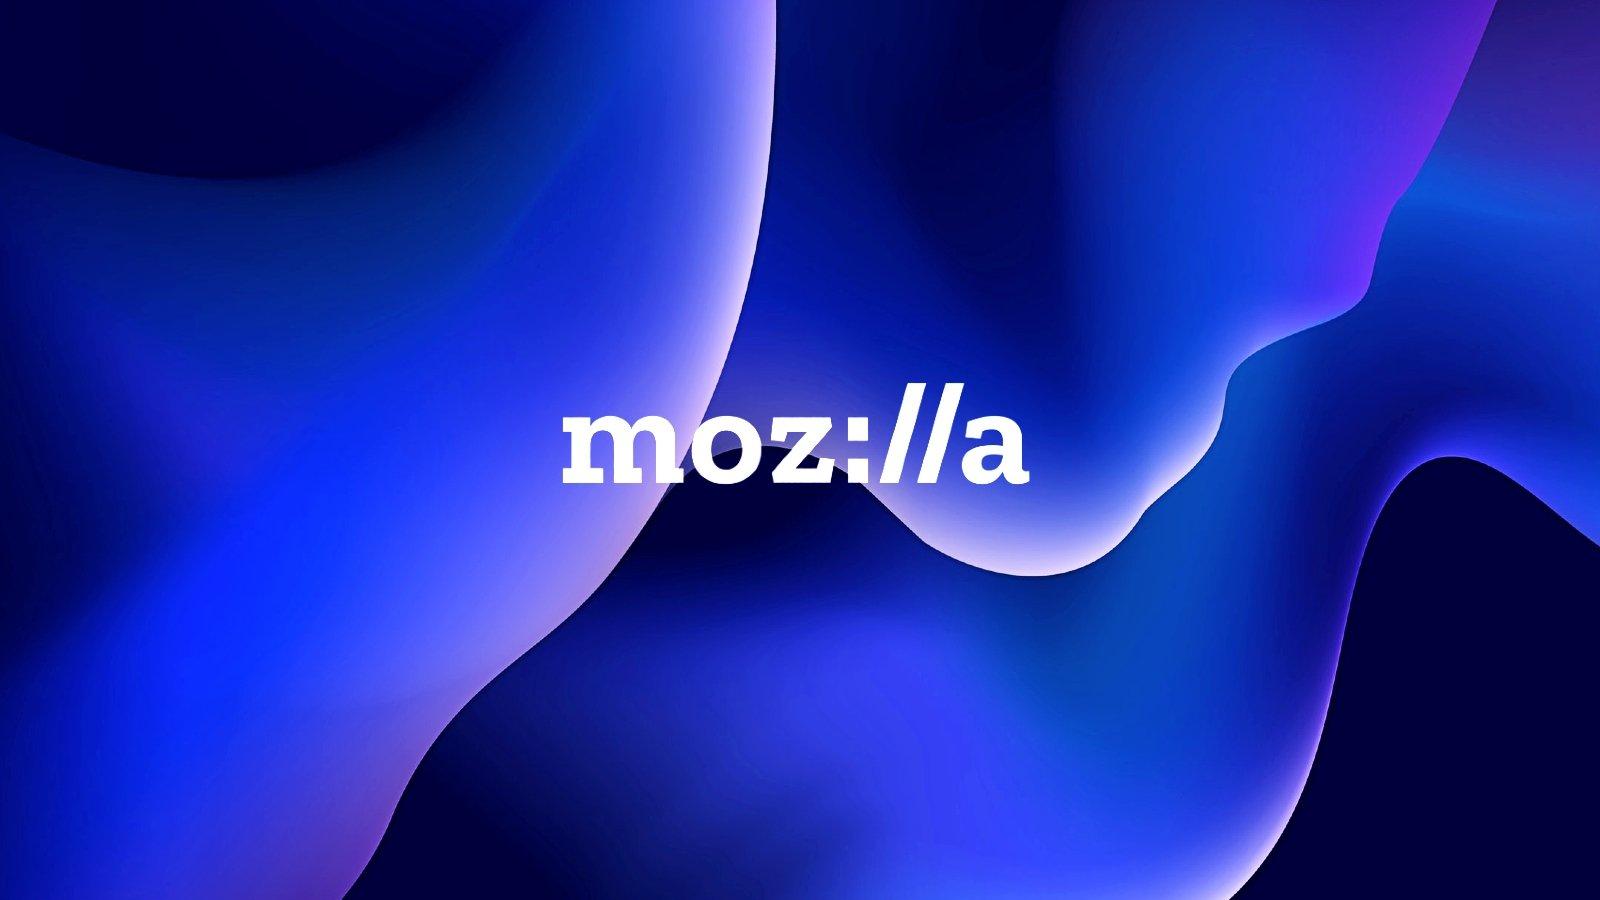 Mozilla: Update Firefox to avoid Netflix, Hulu streaming issues